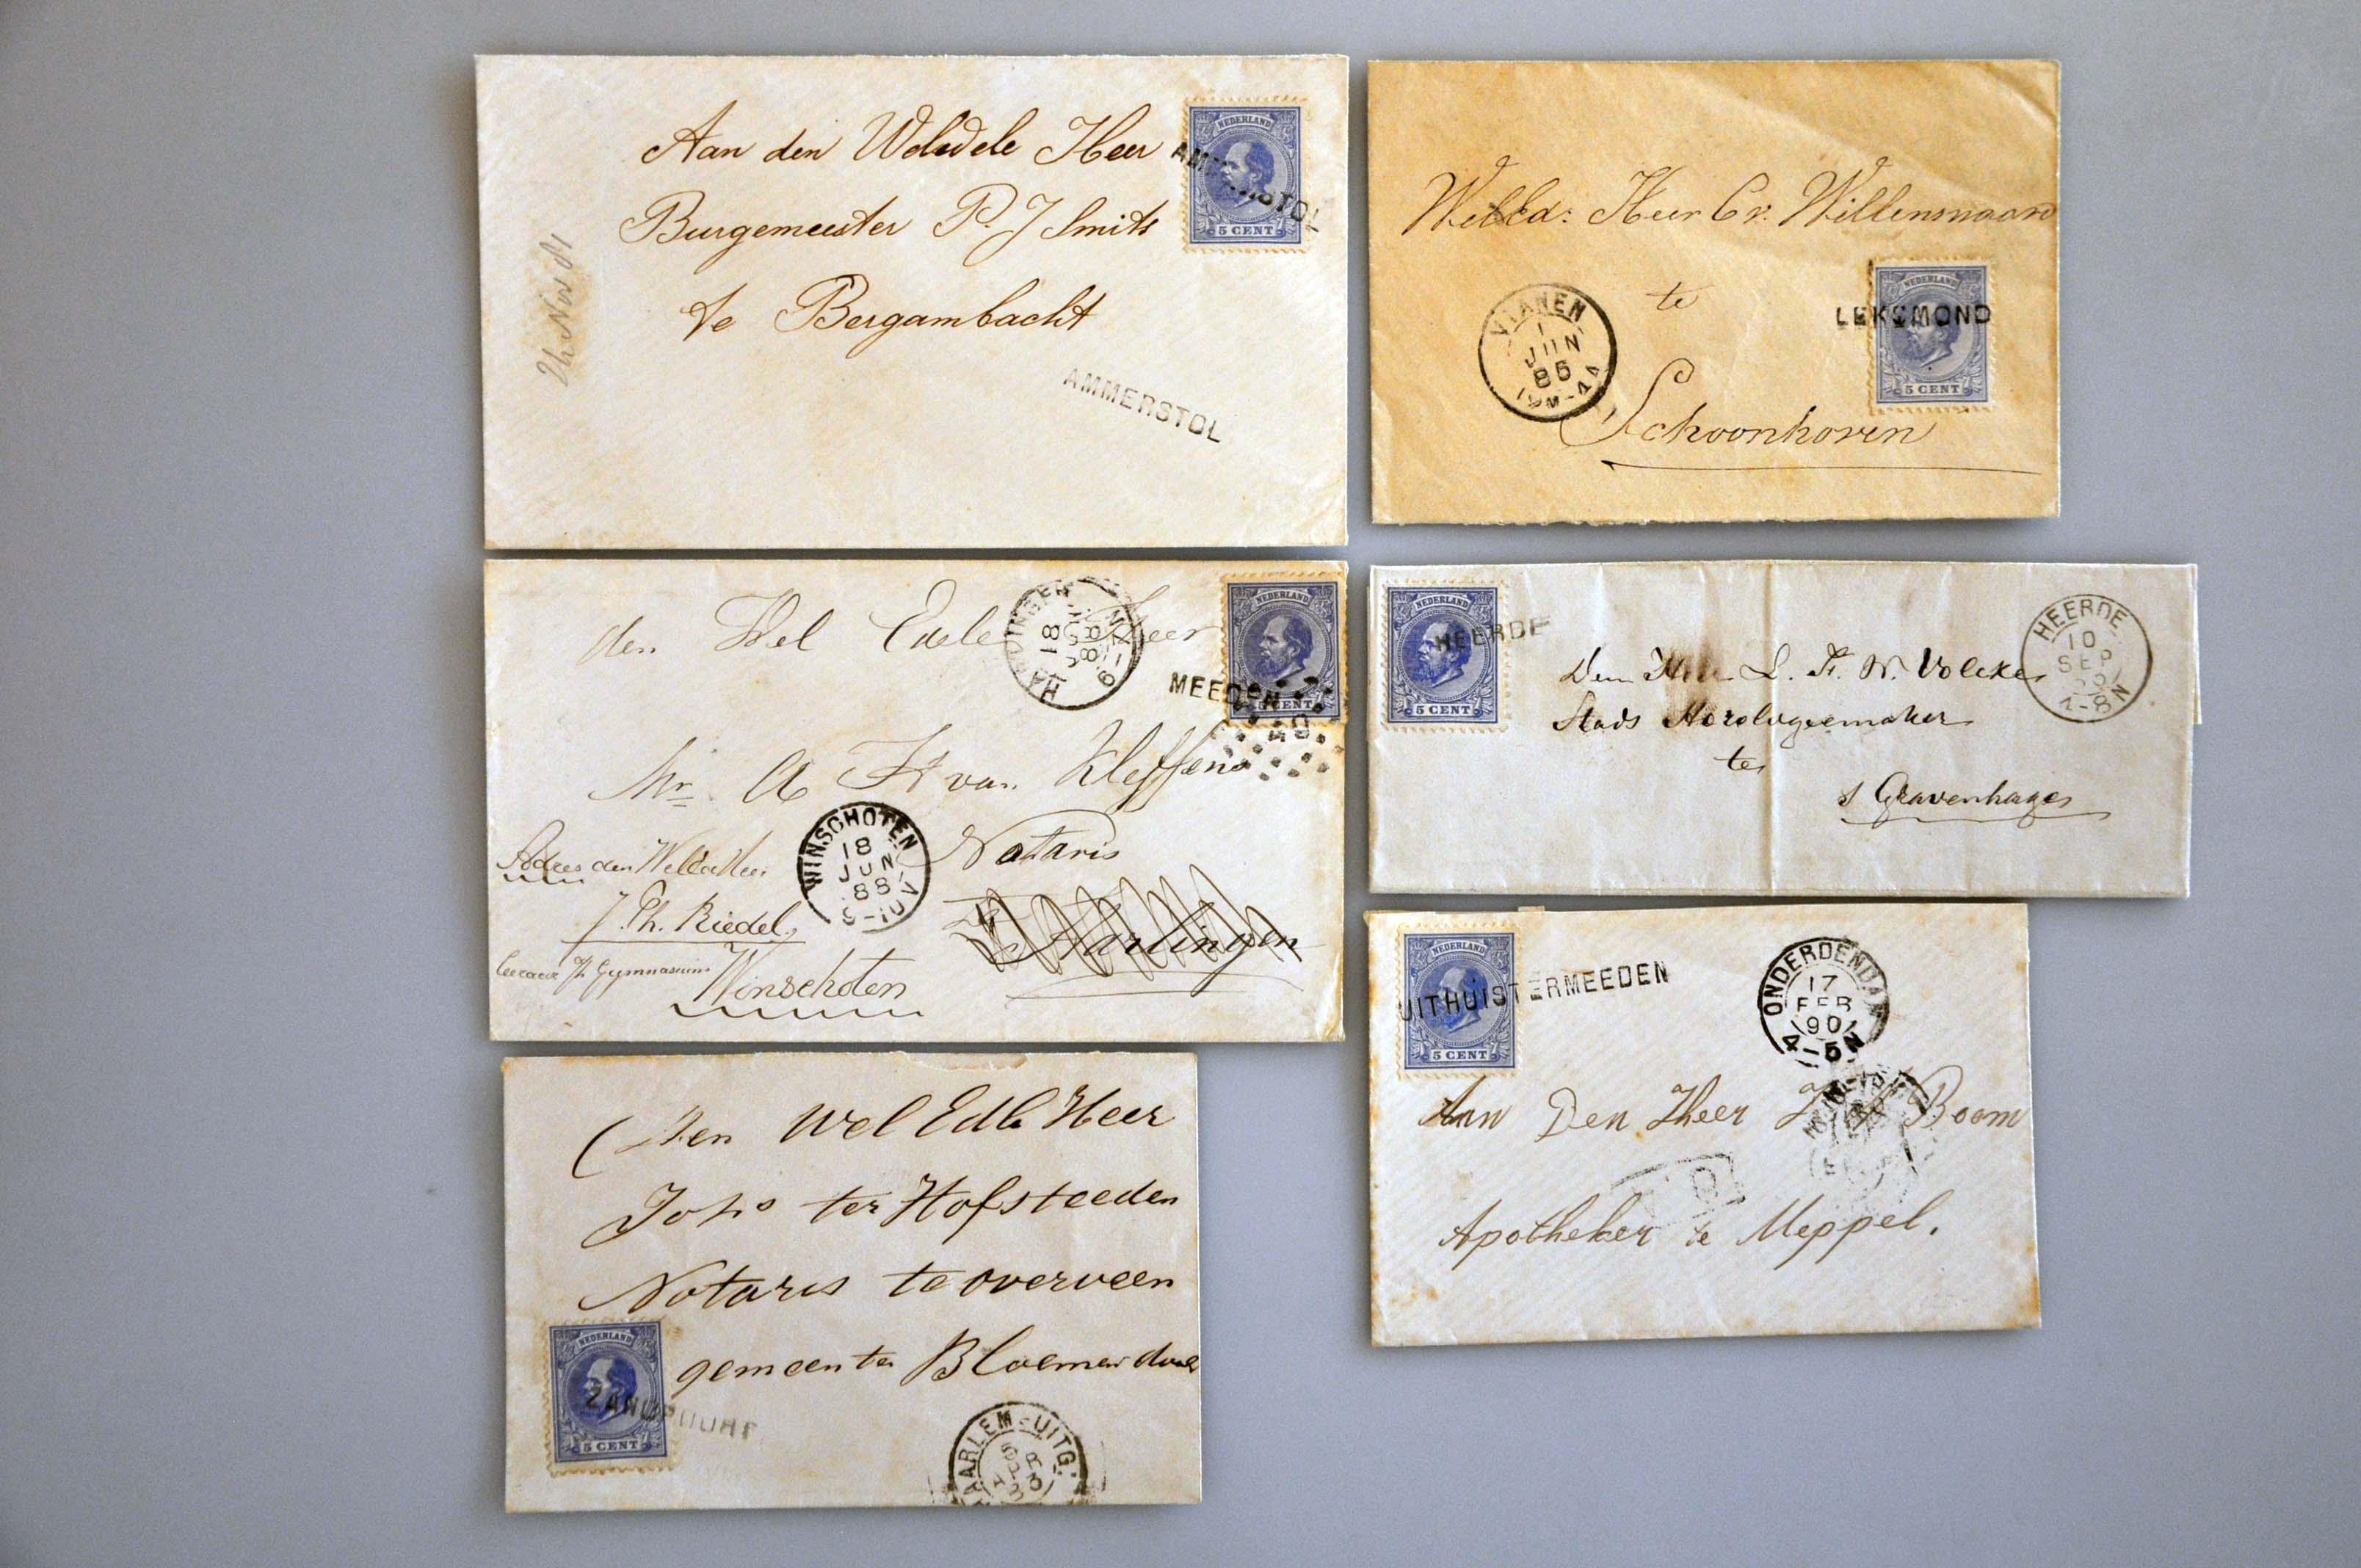 Lot 1455 - Netherlands and former colonies Netherlands -  Corinphila Veilingen Auction 239: General sale